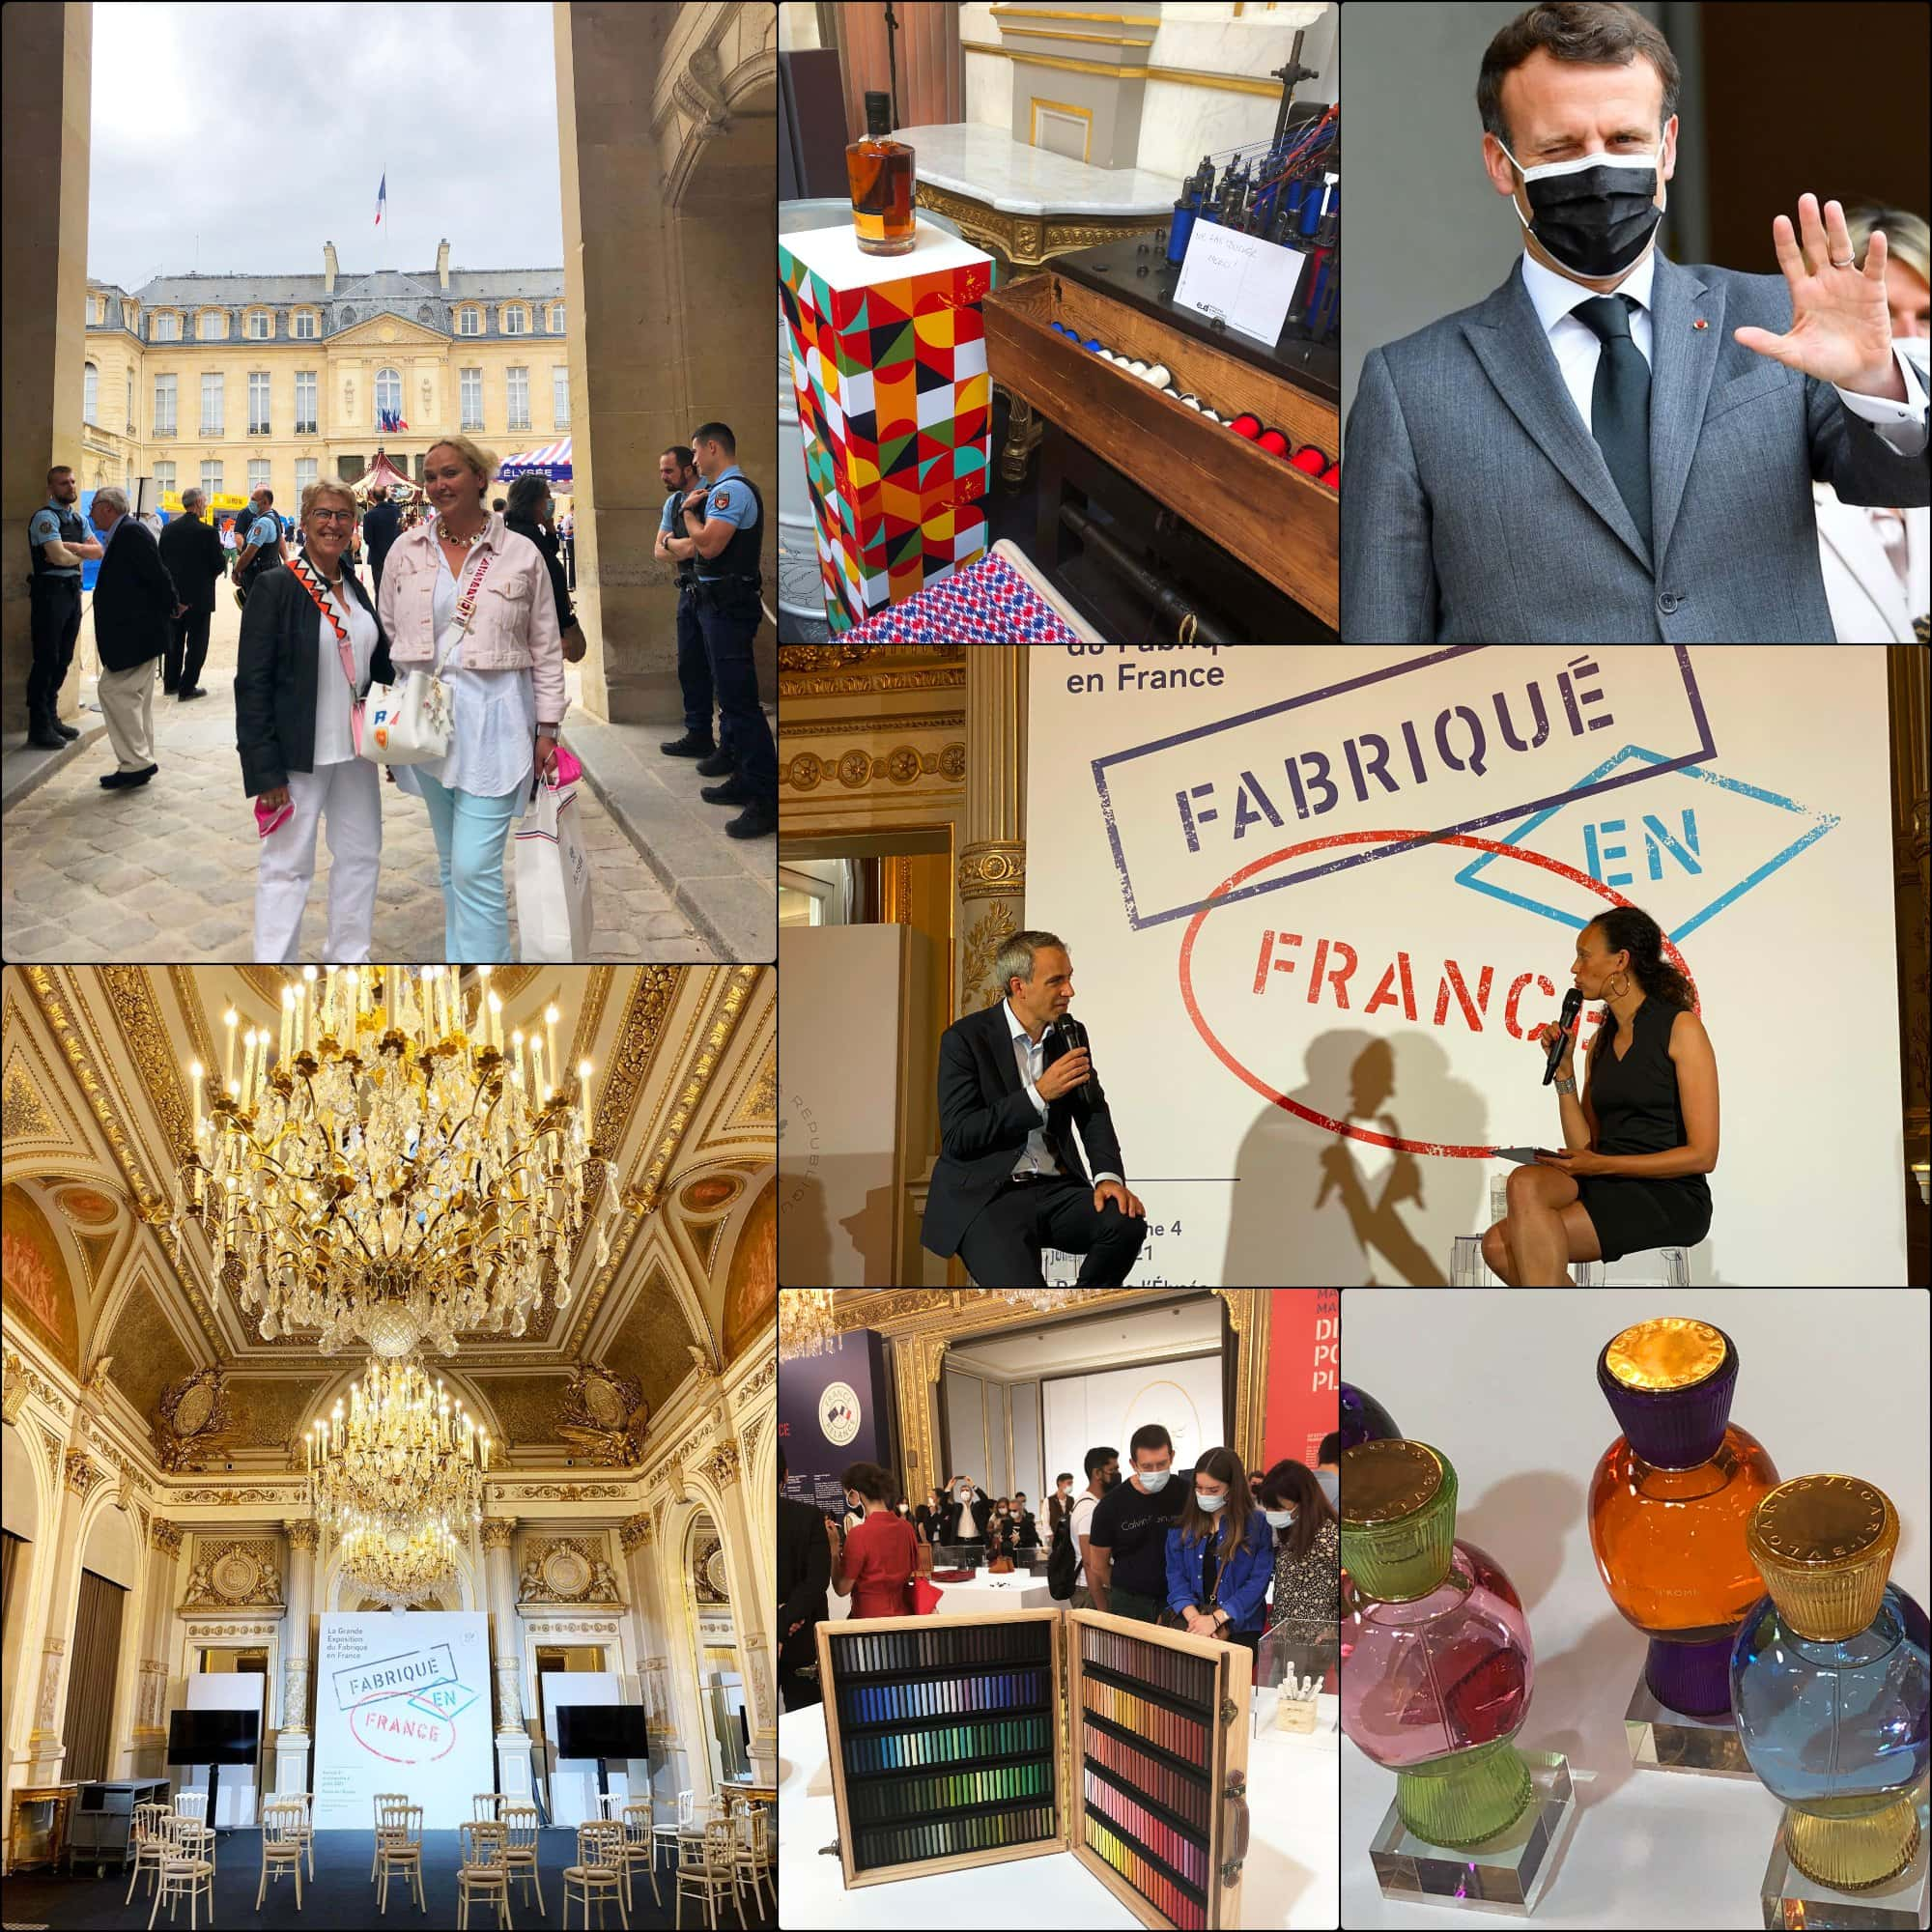 Fabriqué en France 2021 Élysée expo par RUNWAY RIVISTA. Emmanuel Macron